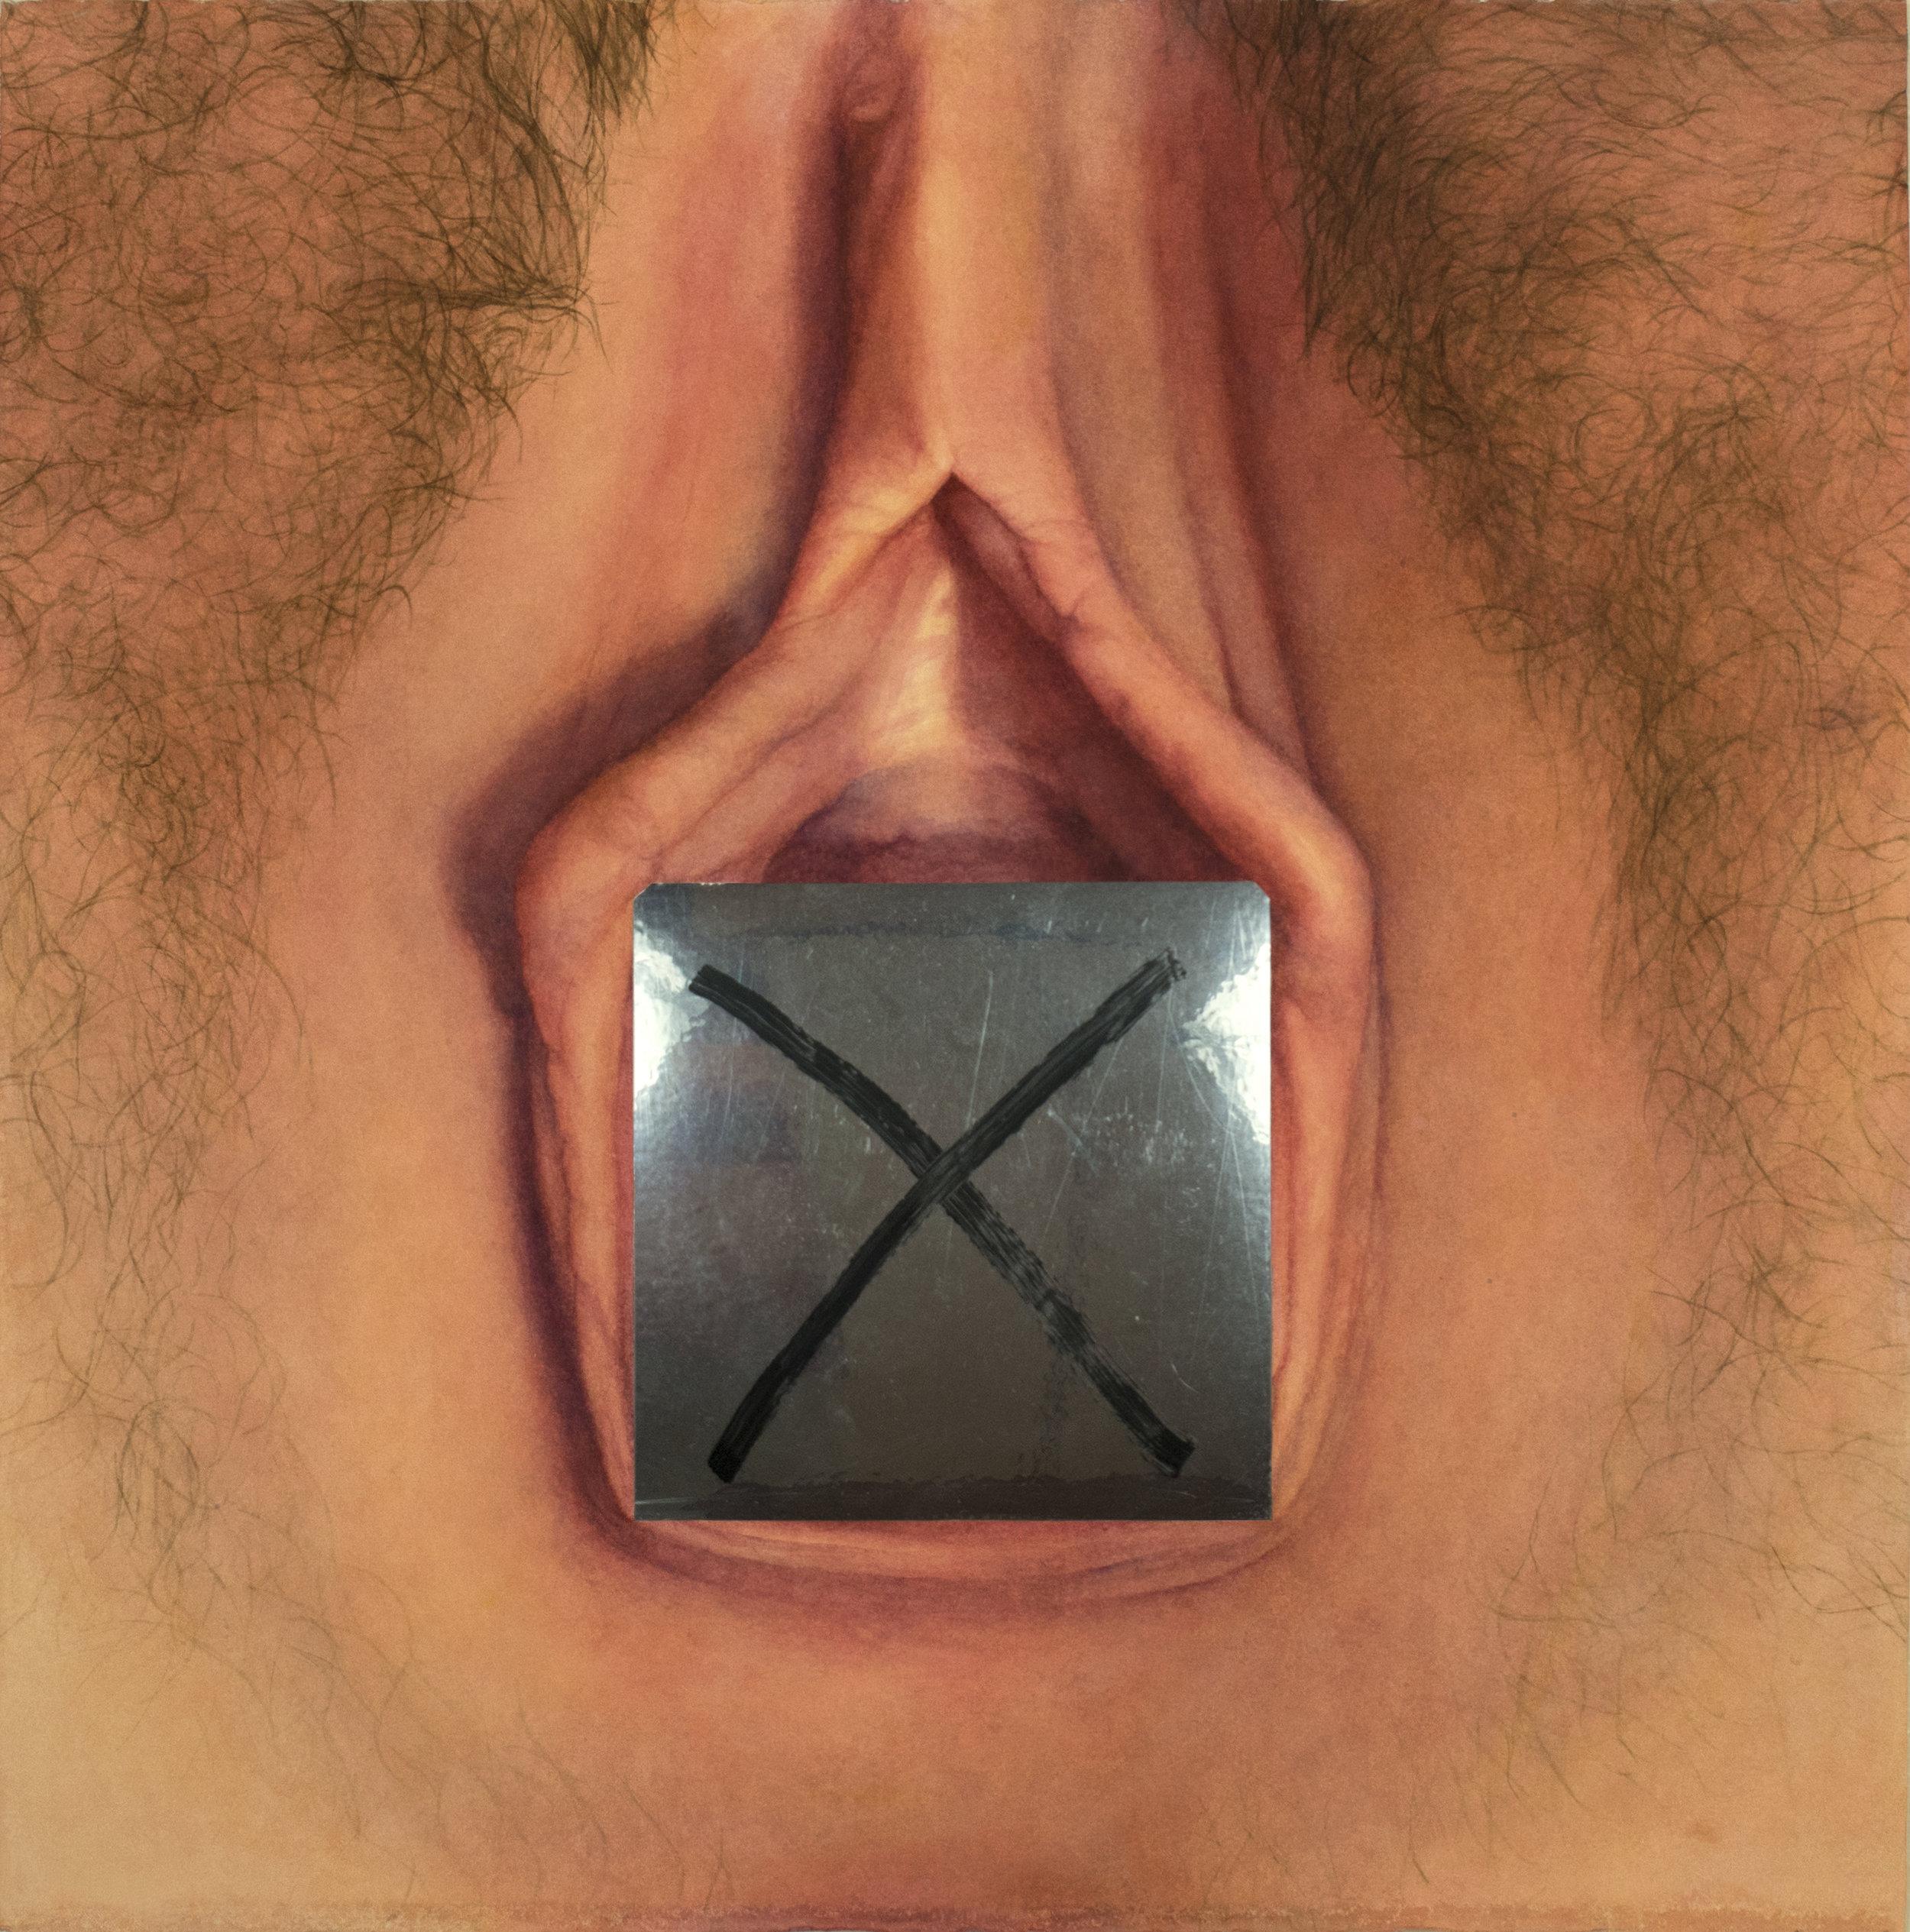 {X mirror, vagina}